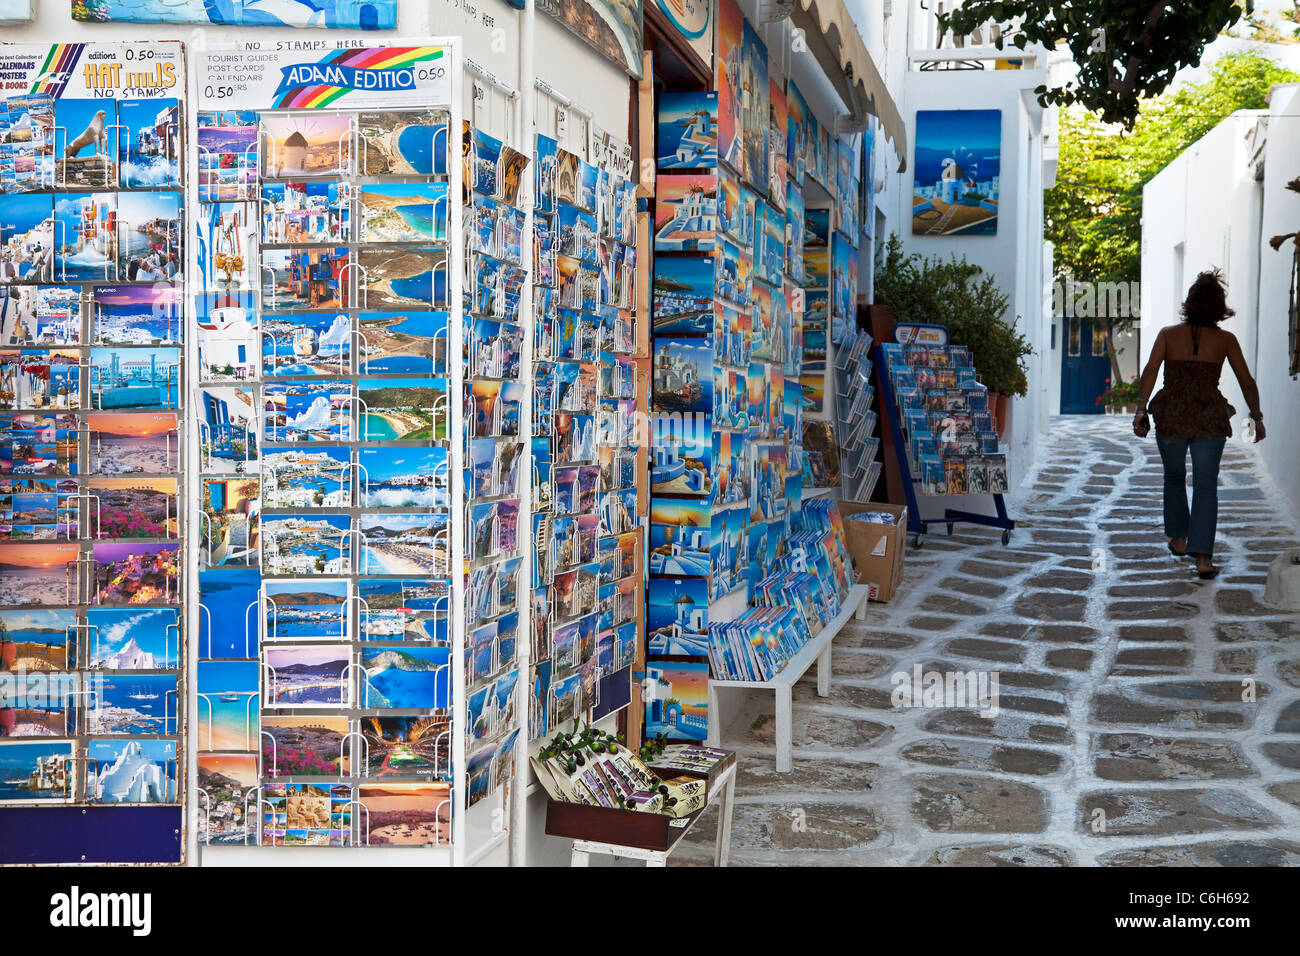 Mykonos (Hora), Cyclades Islands, Greece, Europe - Stock Image